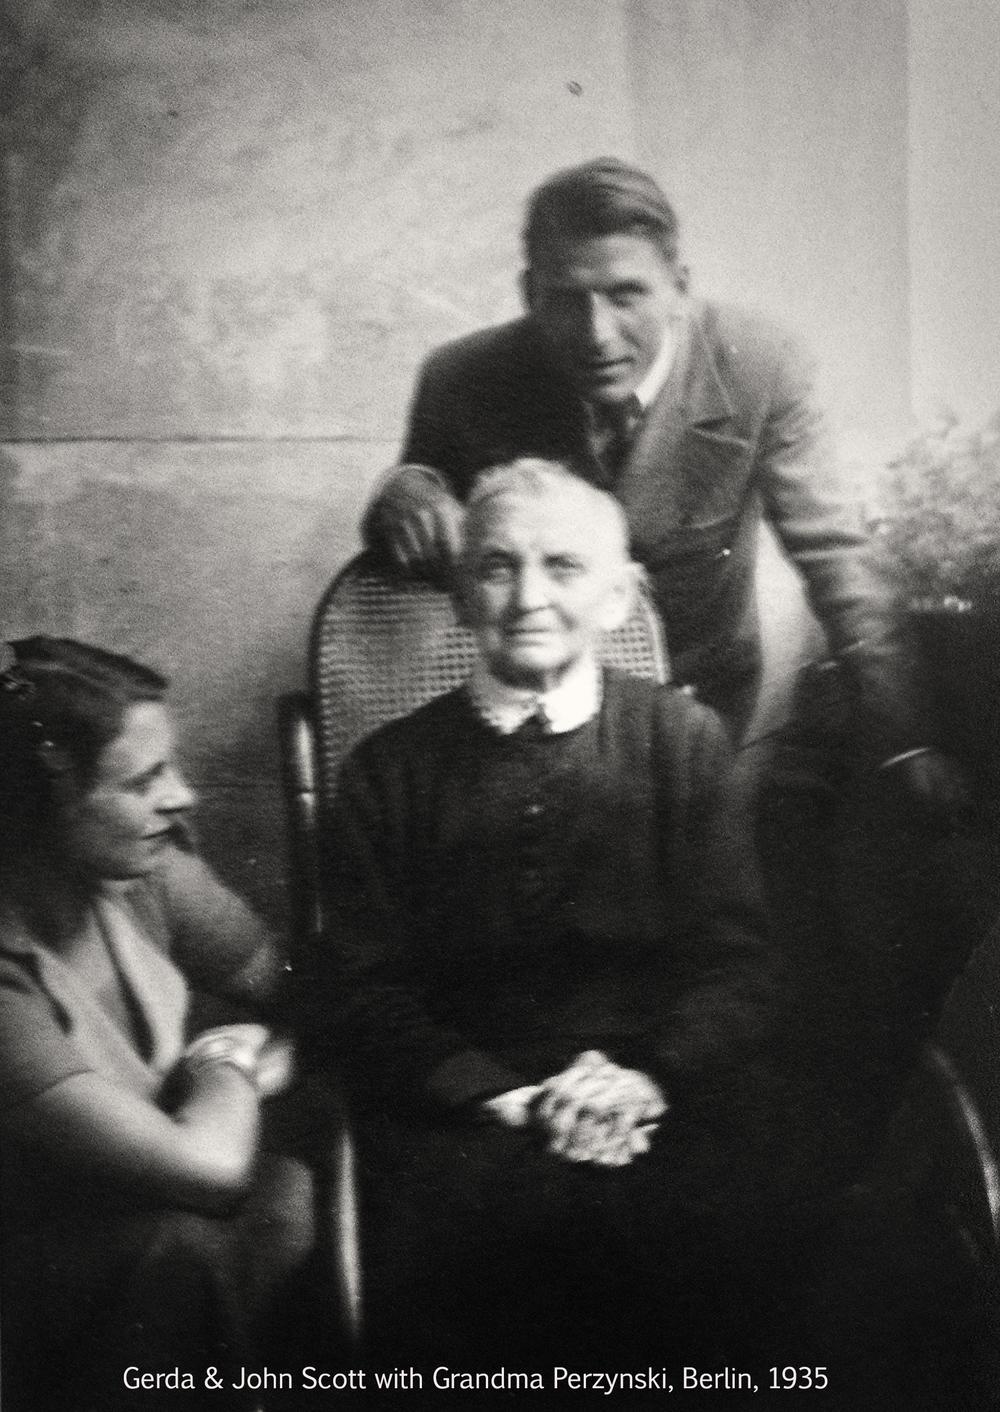 John Gerda & Grandma Perzynski - 1935.jpg